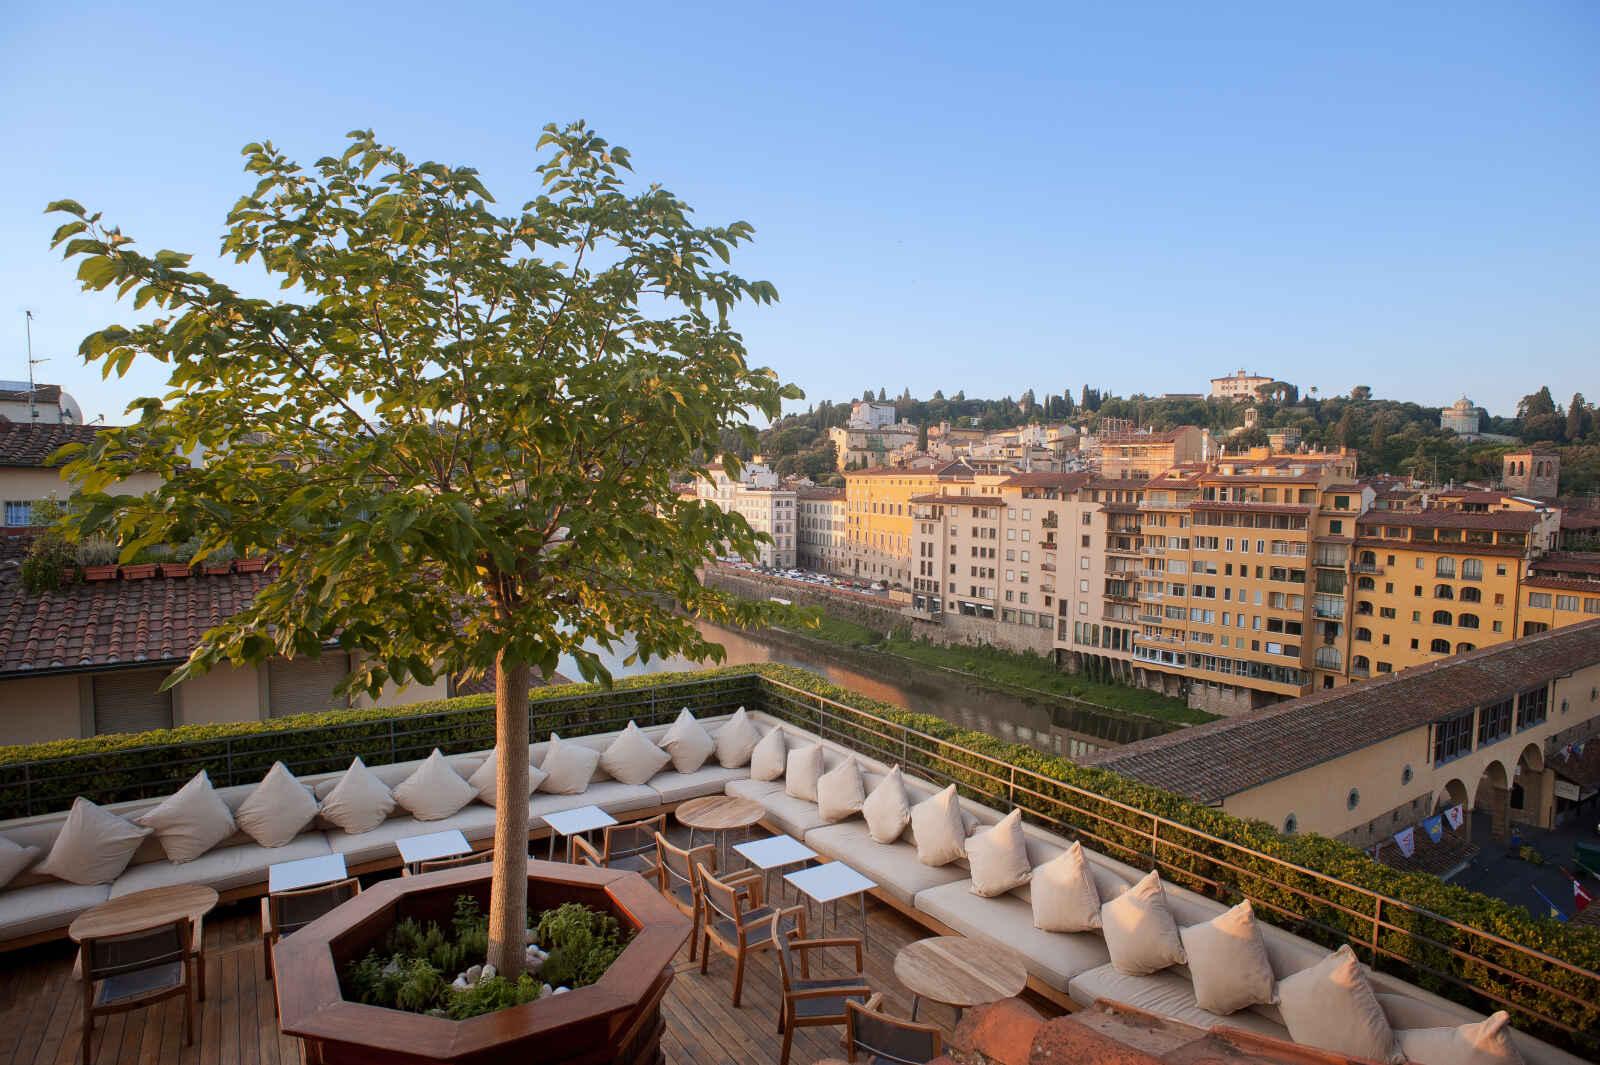 Séjour Toscane - Continentale Florence - 4*